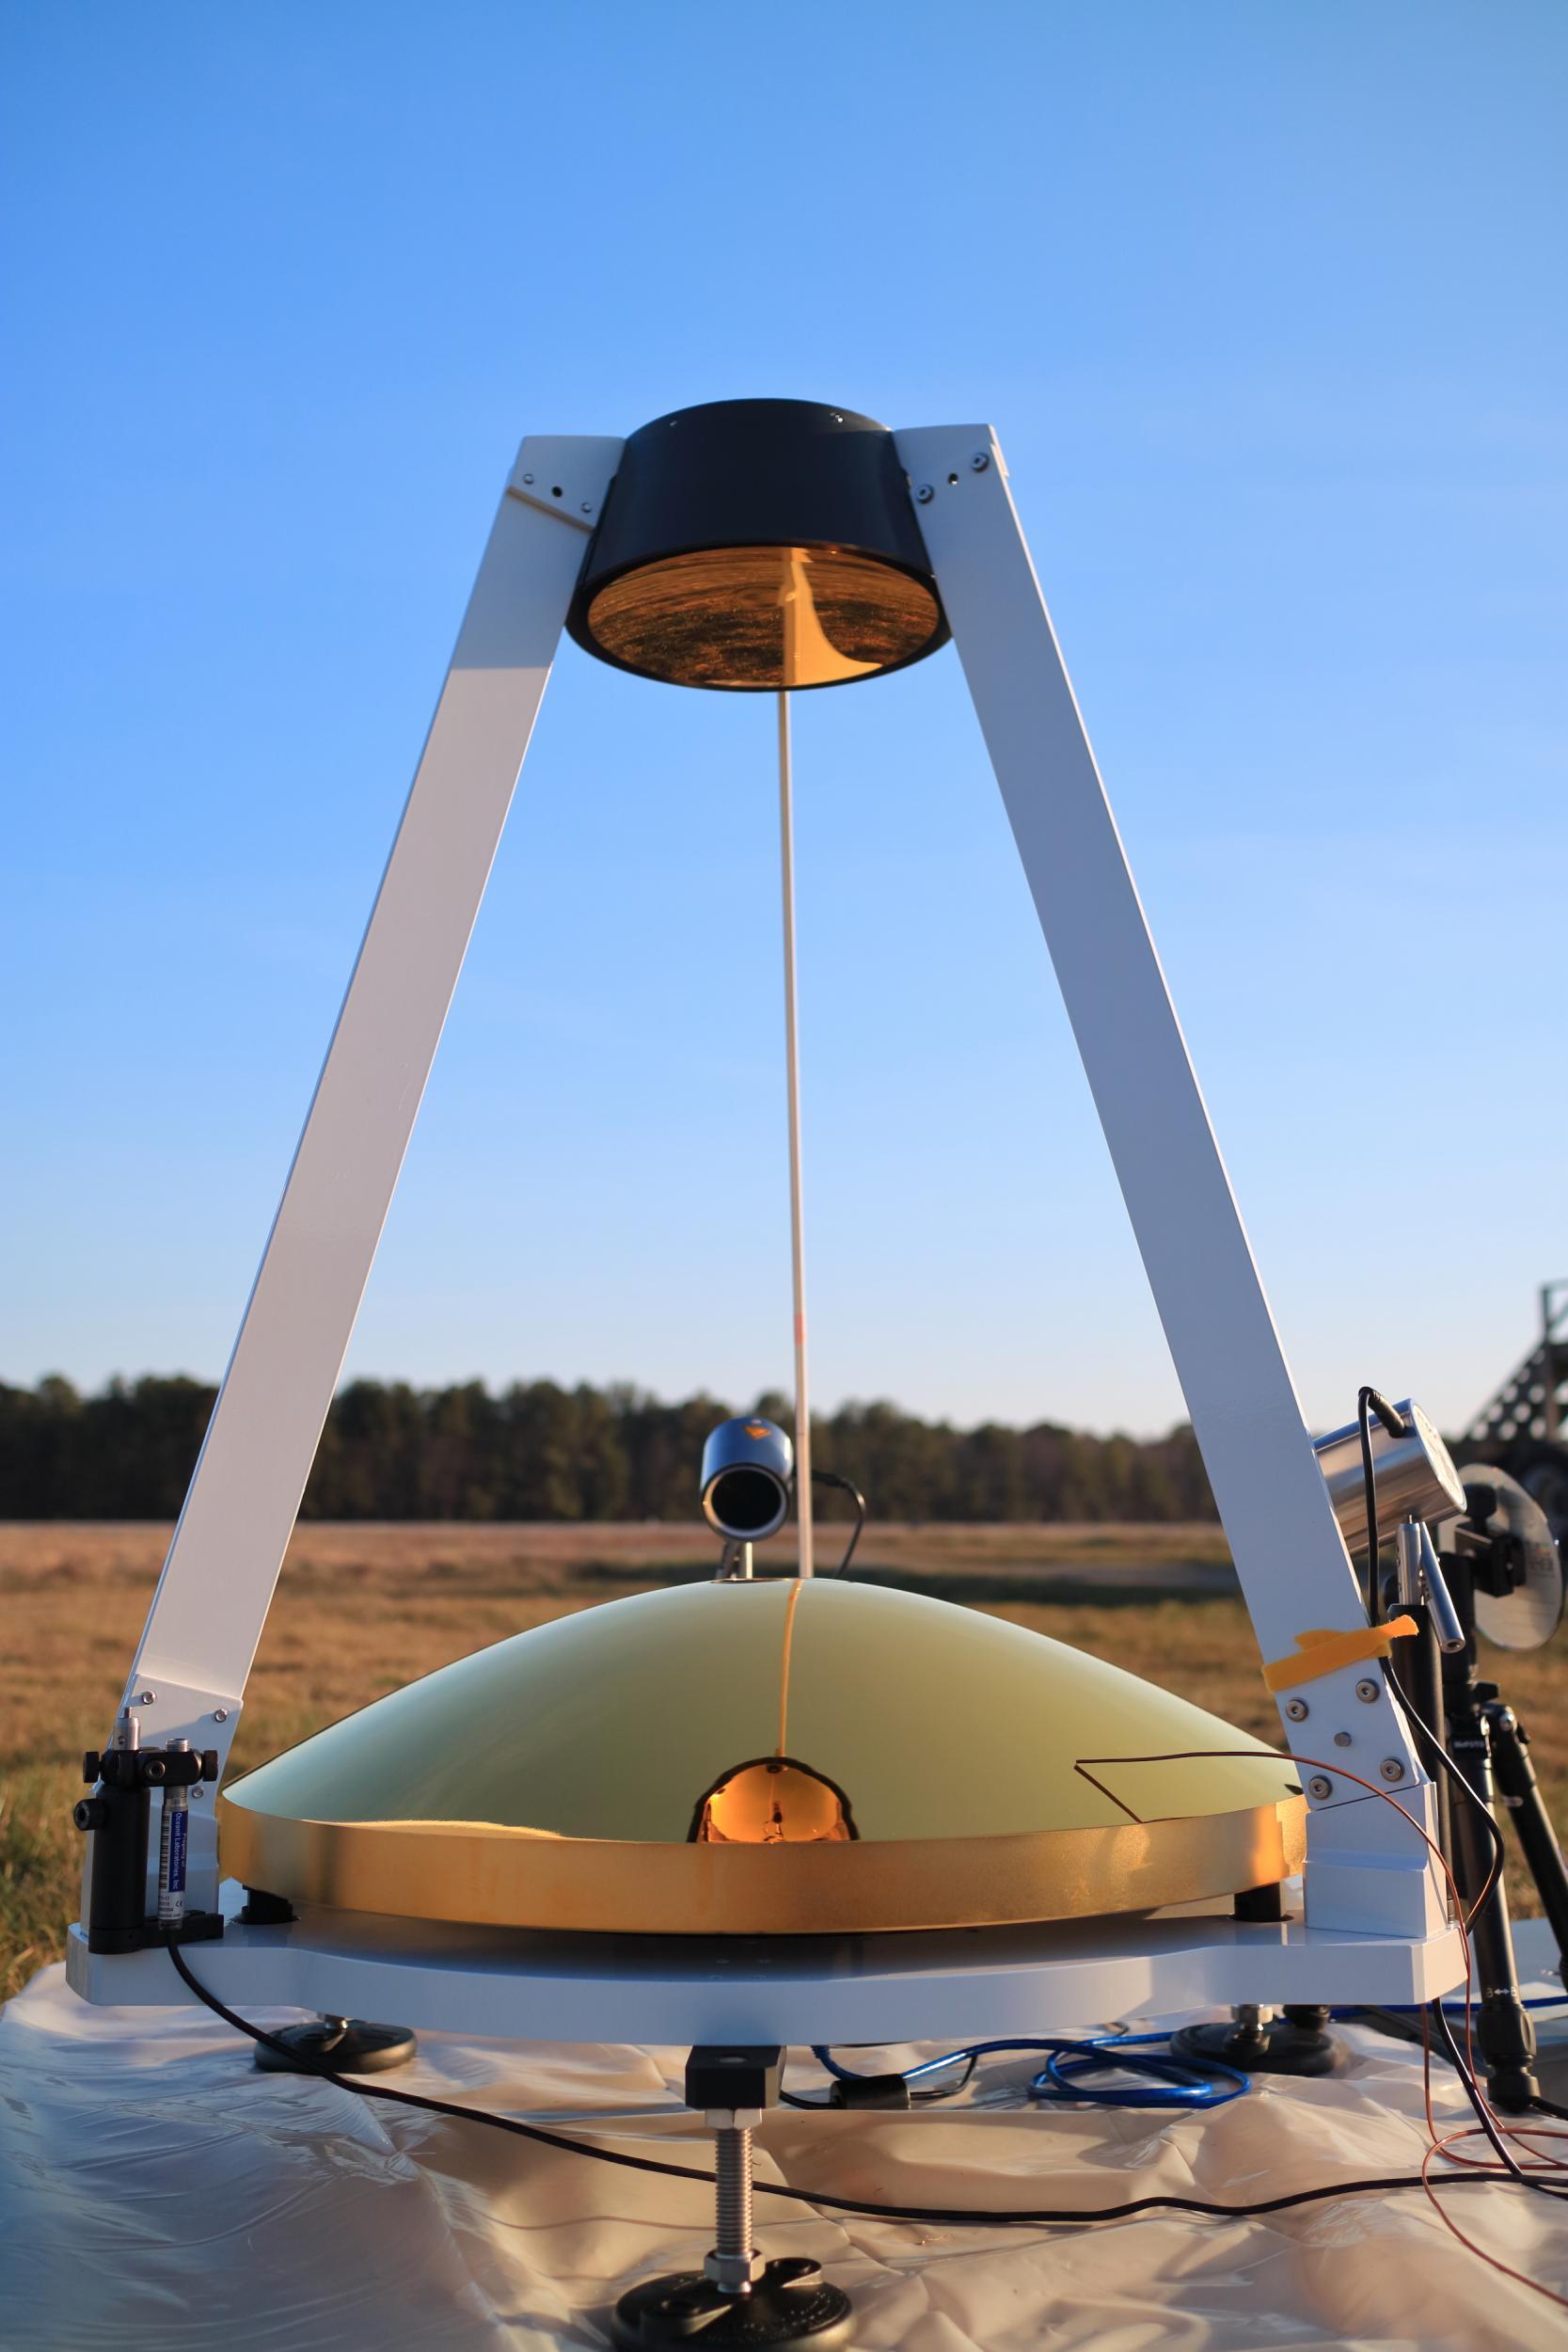 mamba meteorological atmospheric measurement bolometer array